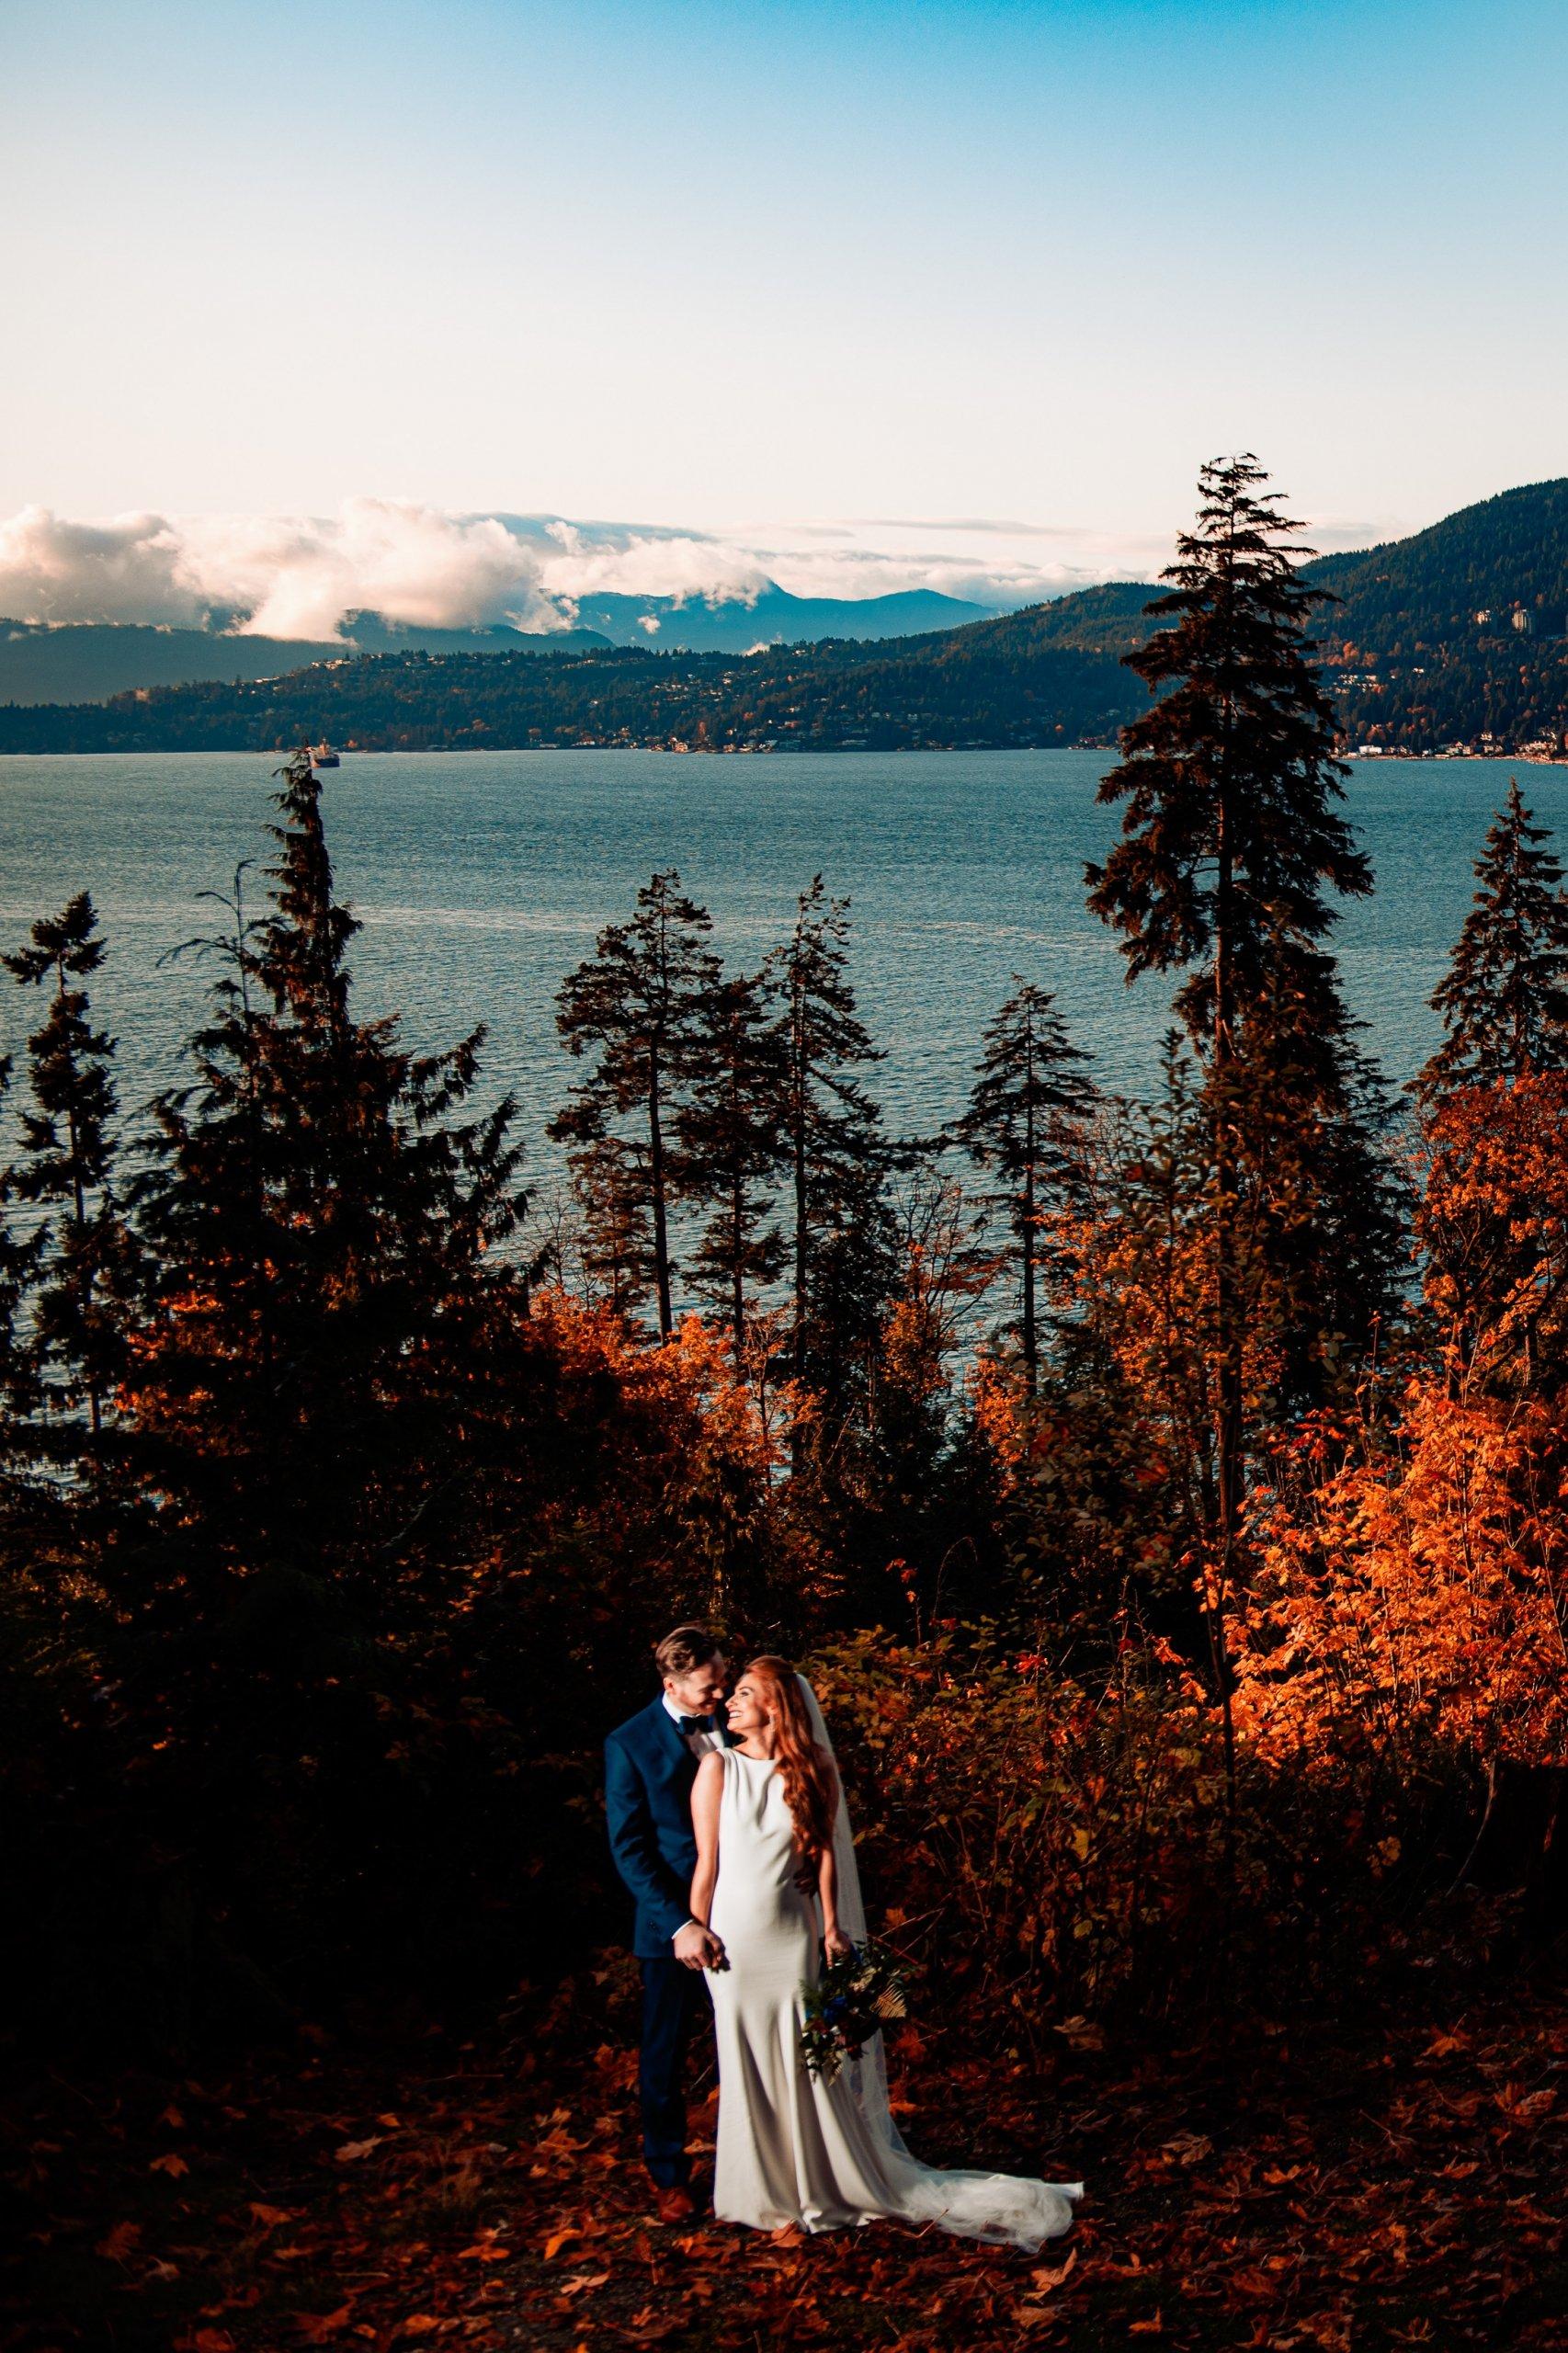 041 - vancouver ocean forest wedding photos